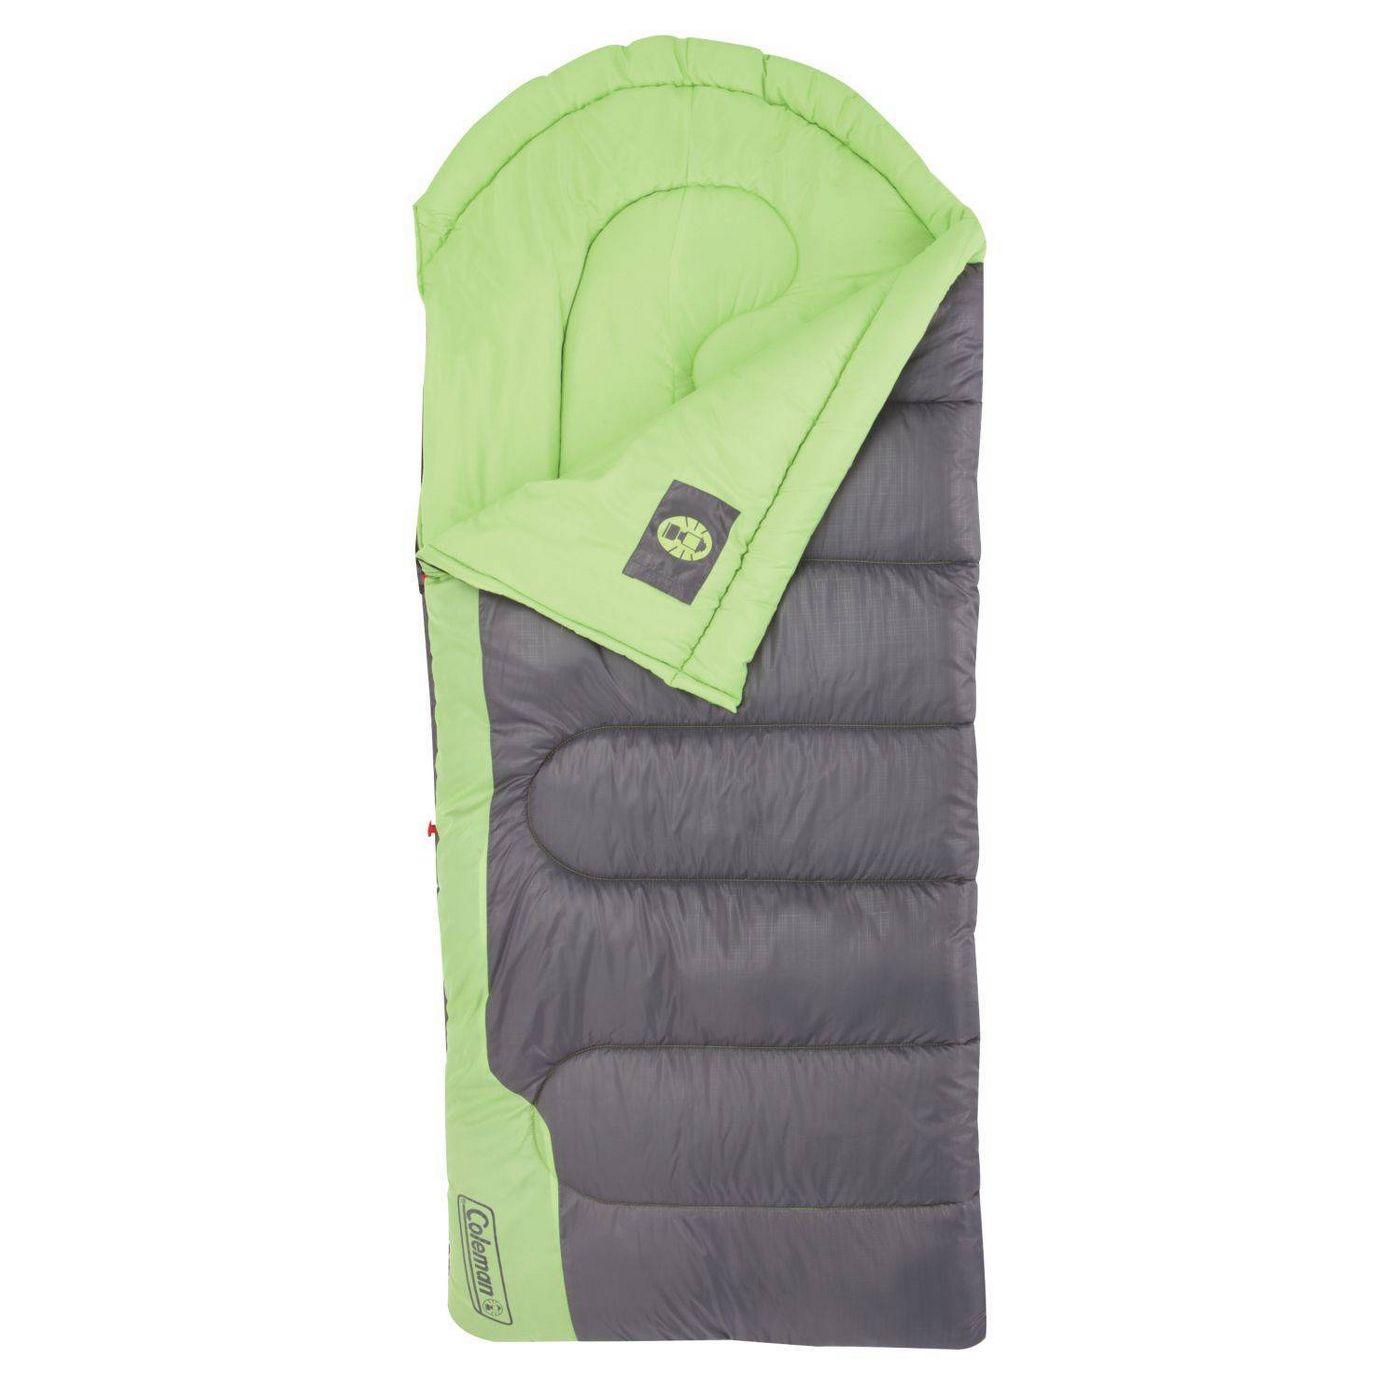 Coleman Raymer 40 Degree Sleeping Bag (Green/Gray)